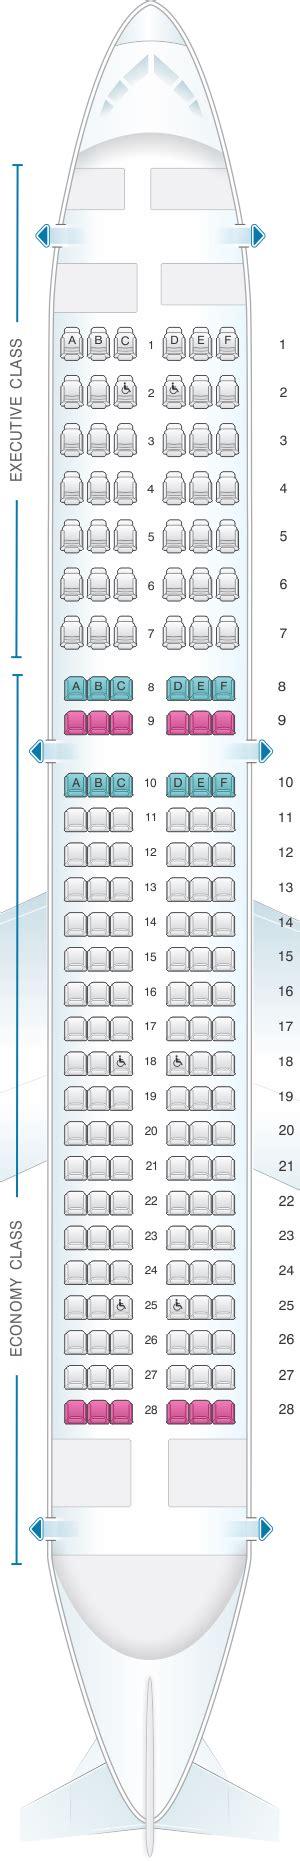 plan de cabine tap portugal airbus a320 seatmaestro fr